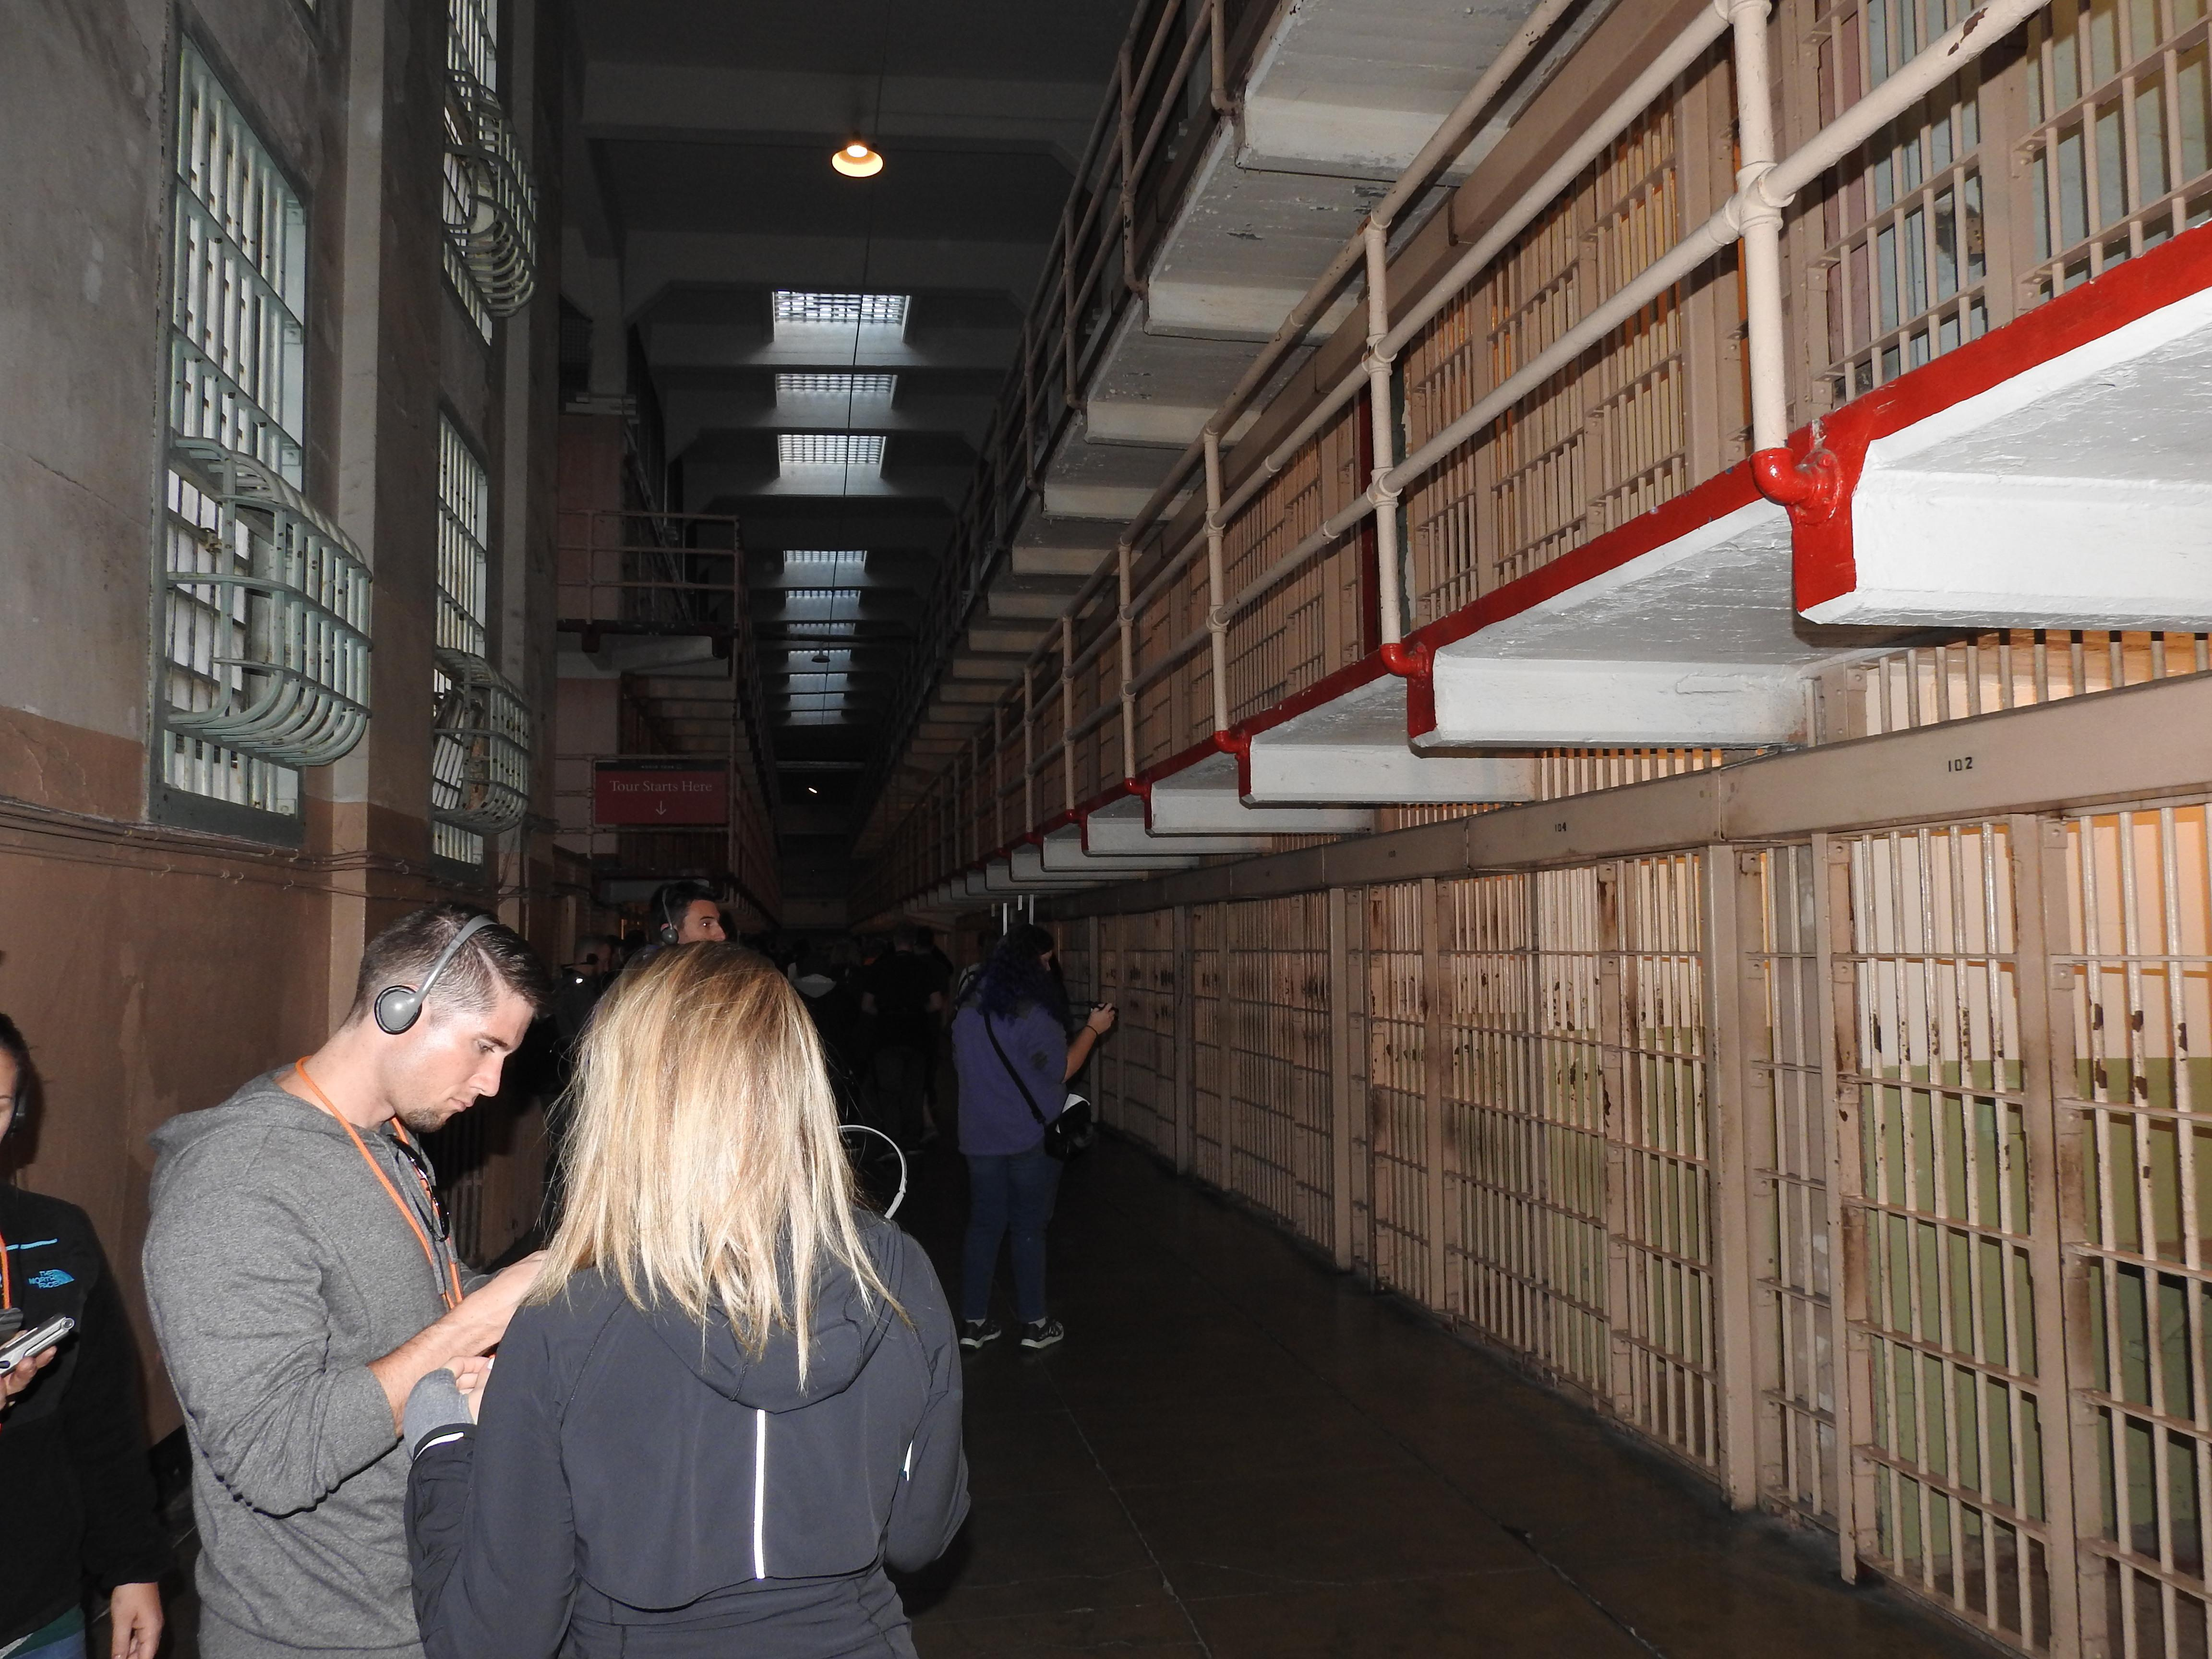 Alcatraz Tours Reviews | Alcatraz Island Reviews | Alcatraz